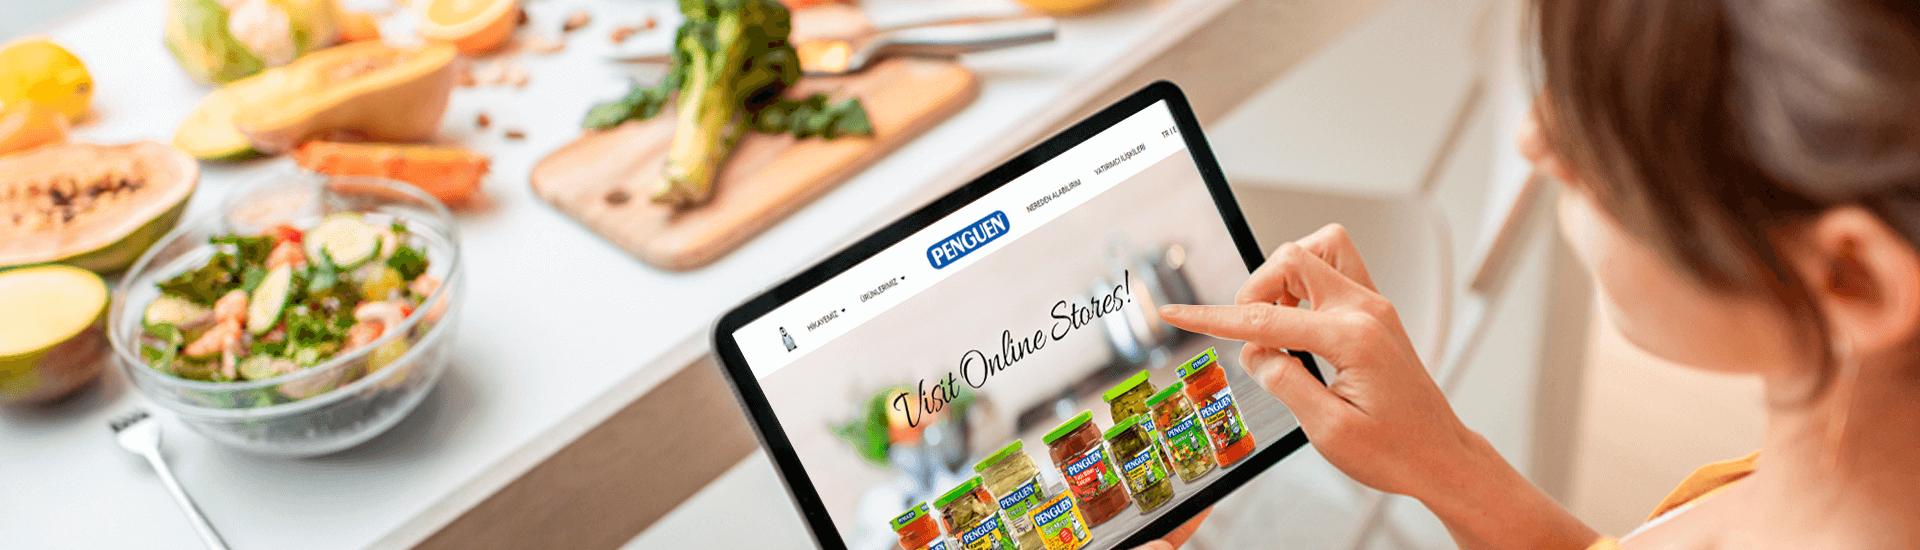 PENGUEN-online-satis-sayfasi